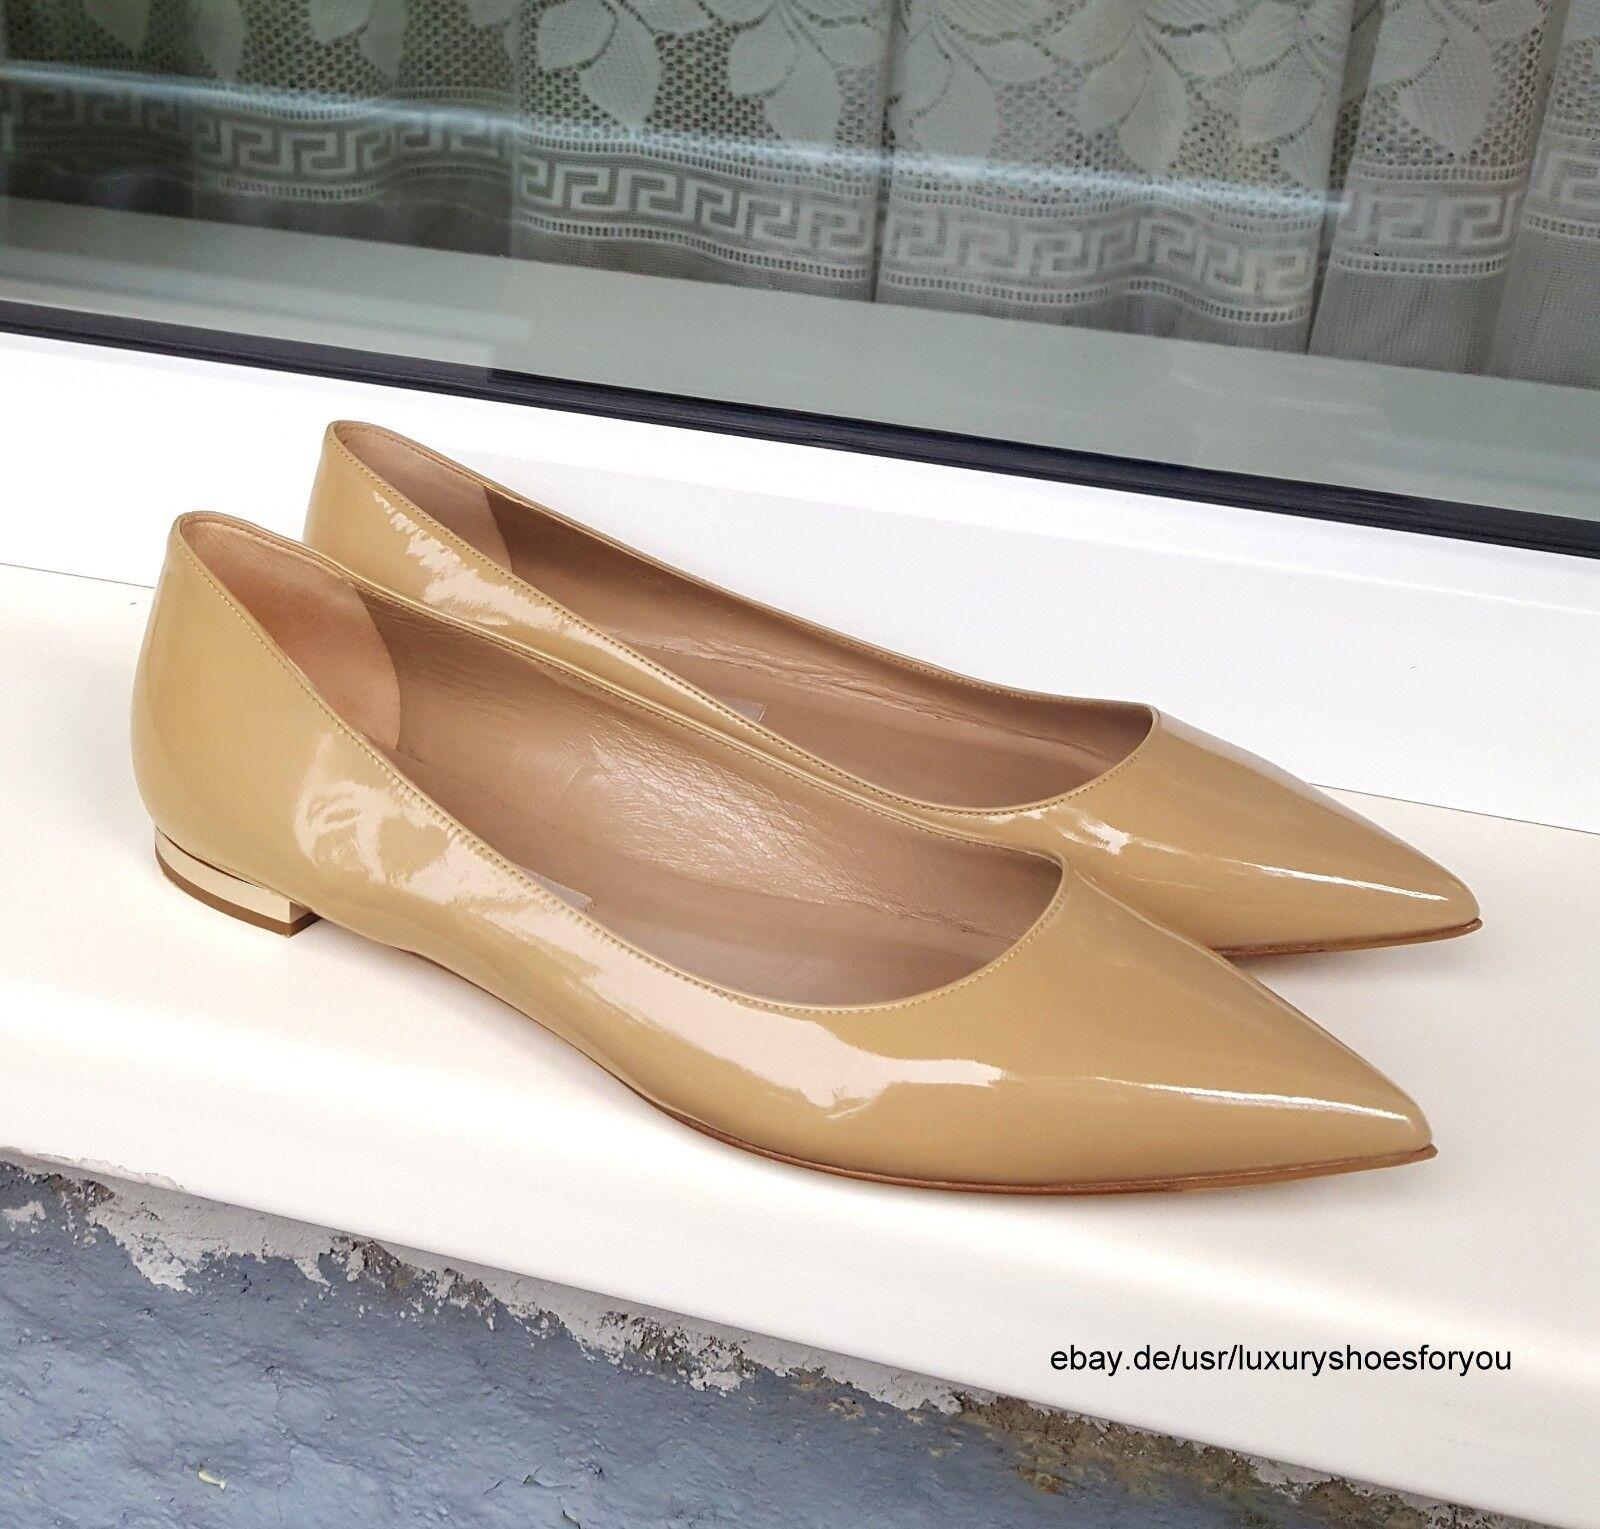 BURBERRY Beige Patent Patent Patent Leather Flats gr. EUR 39 272b2a